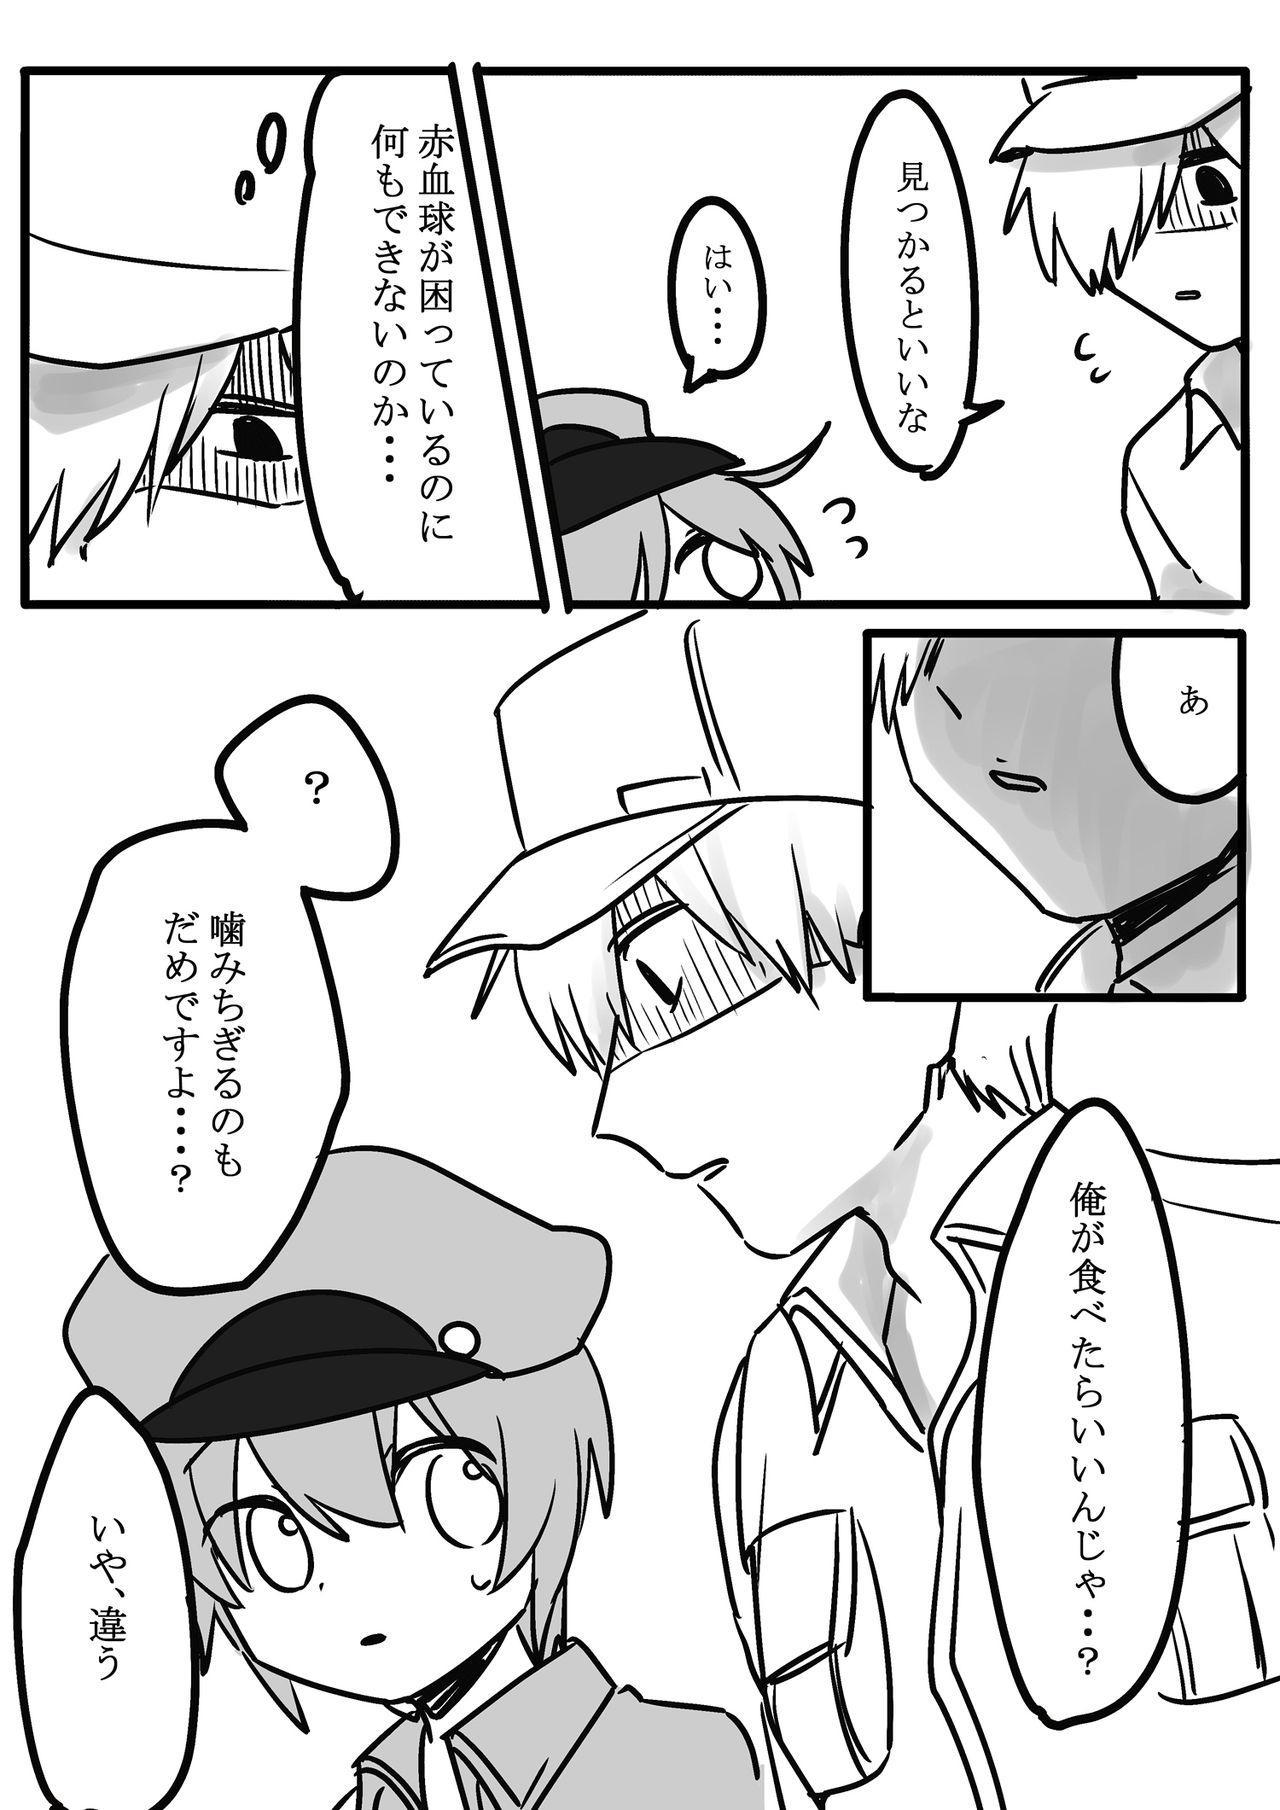 Futanari Aka x Shiro 3